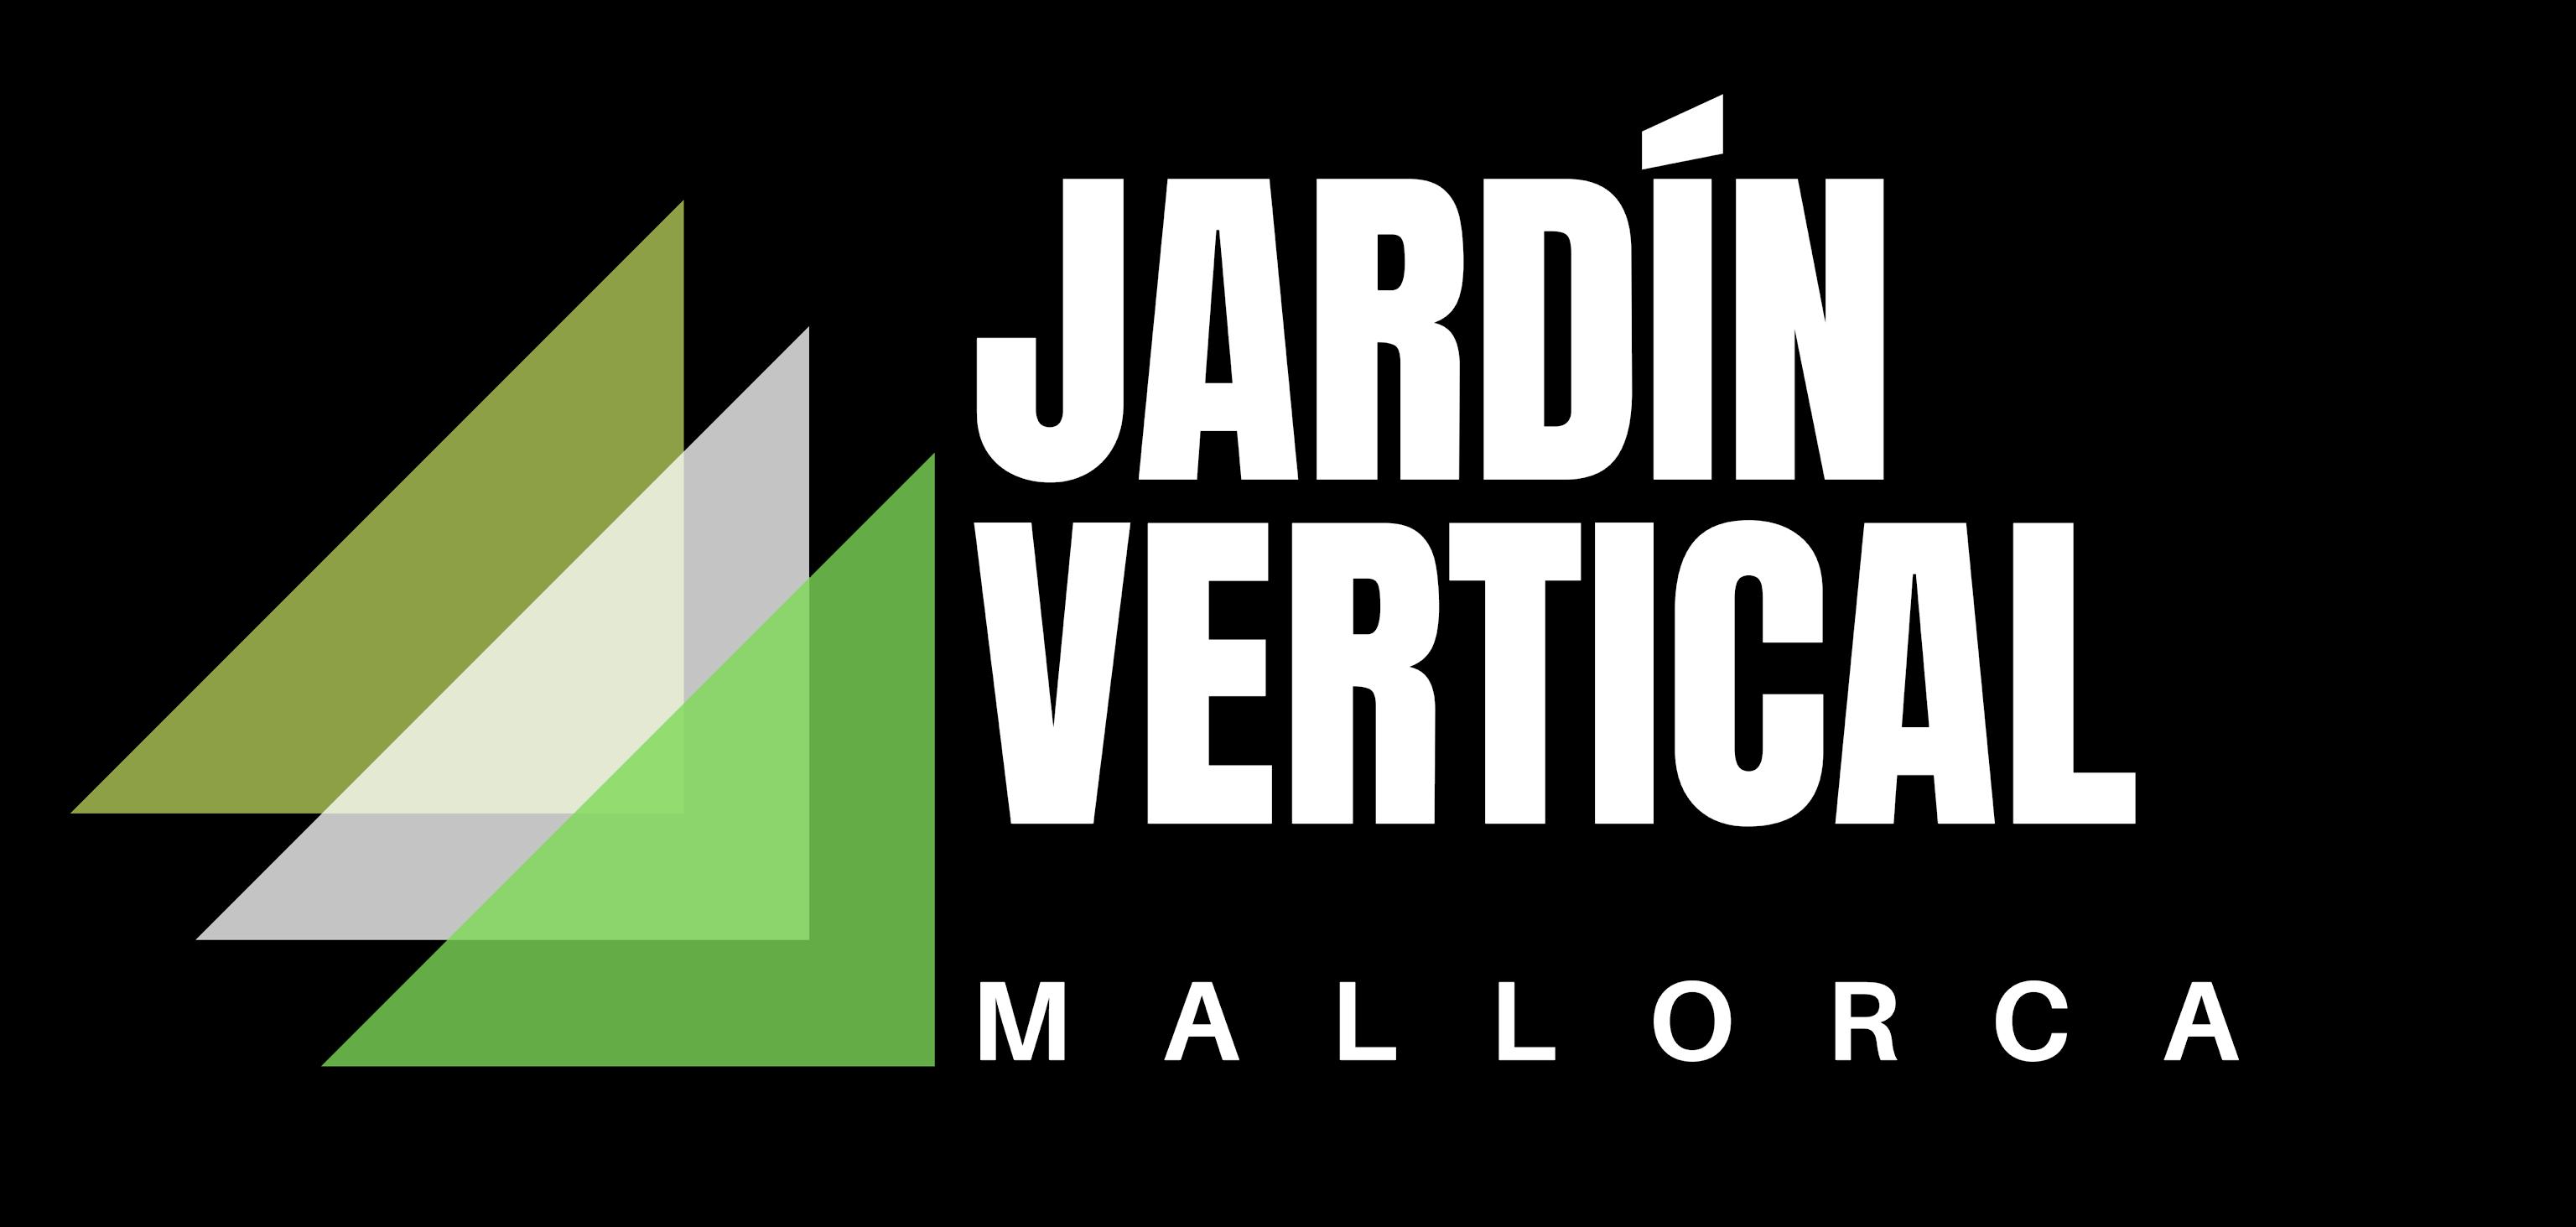 logo jardin vertical mallorca